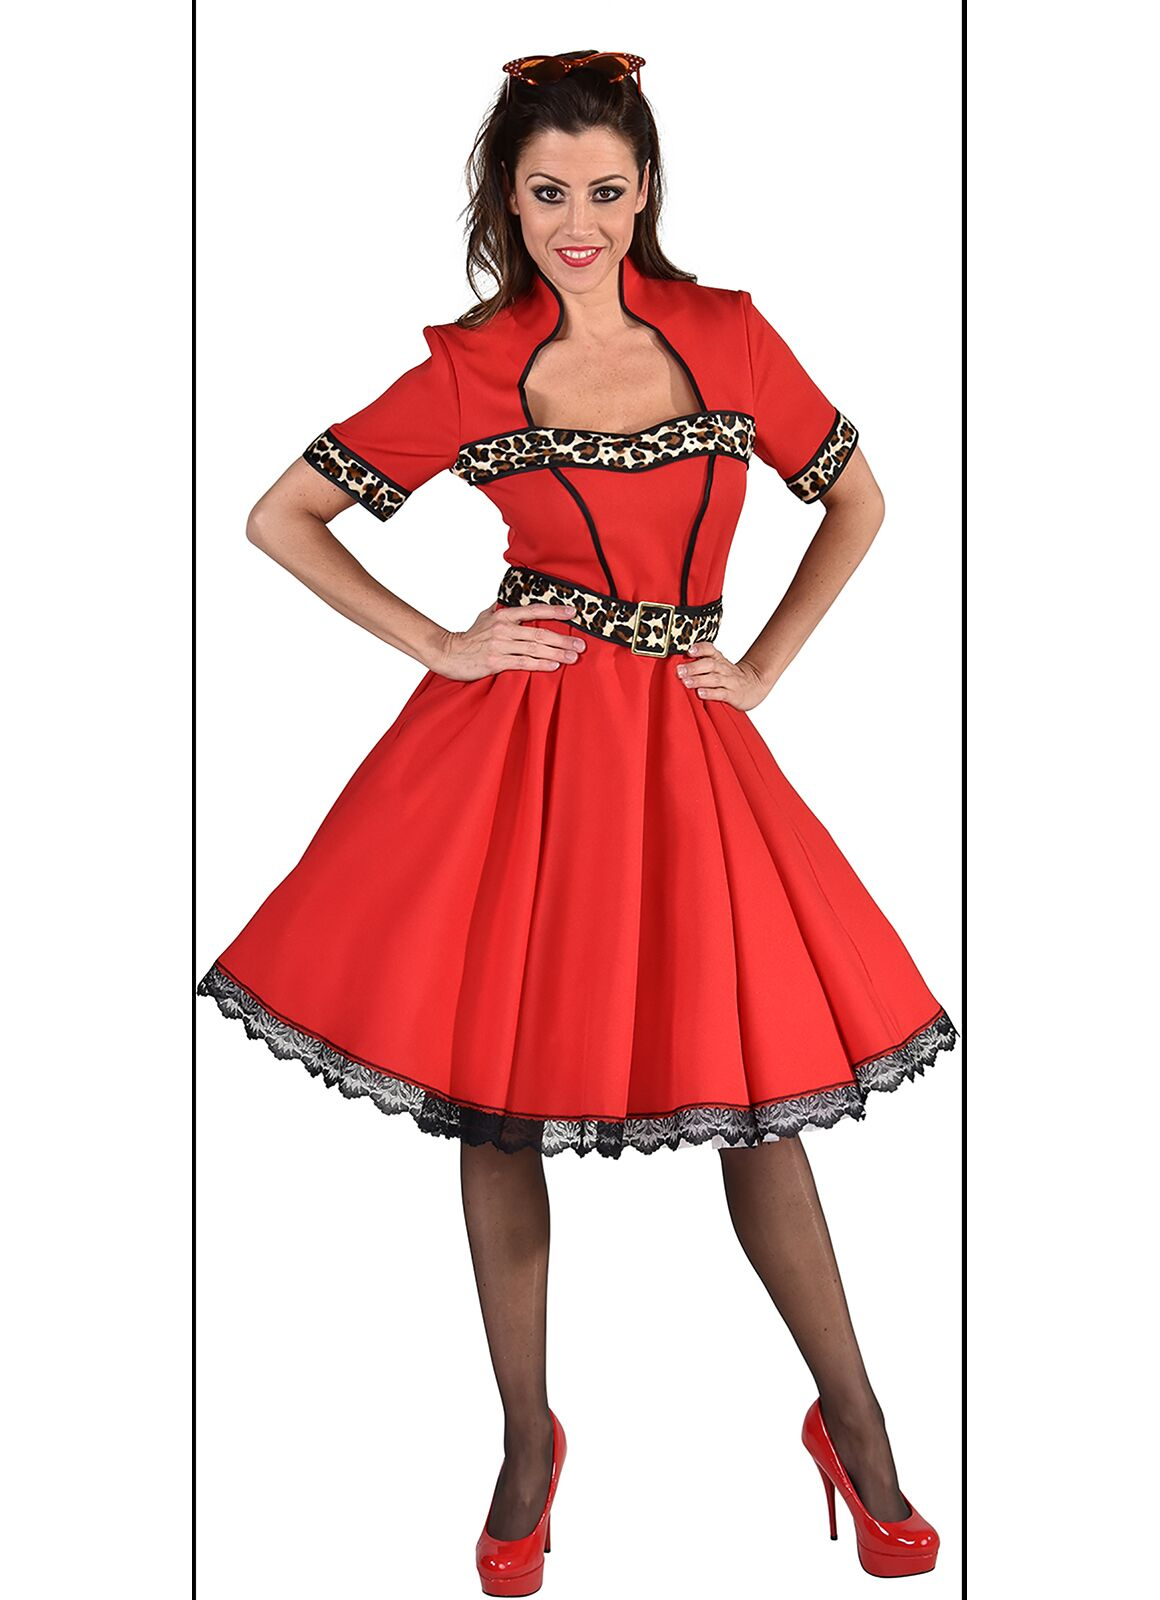 50's jurk sheeba/rood 1